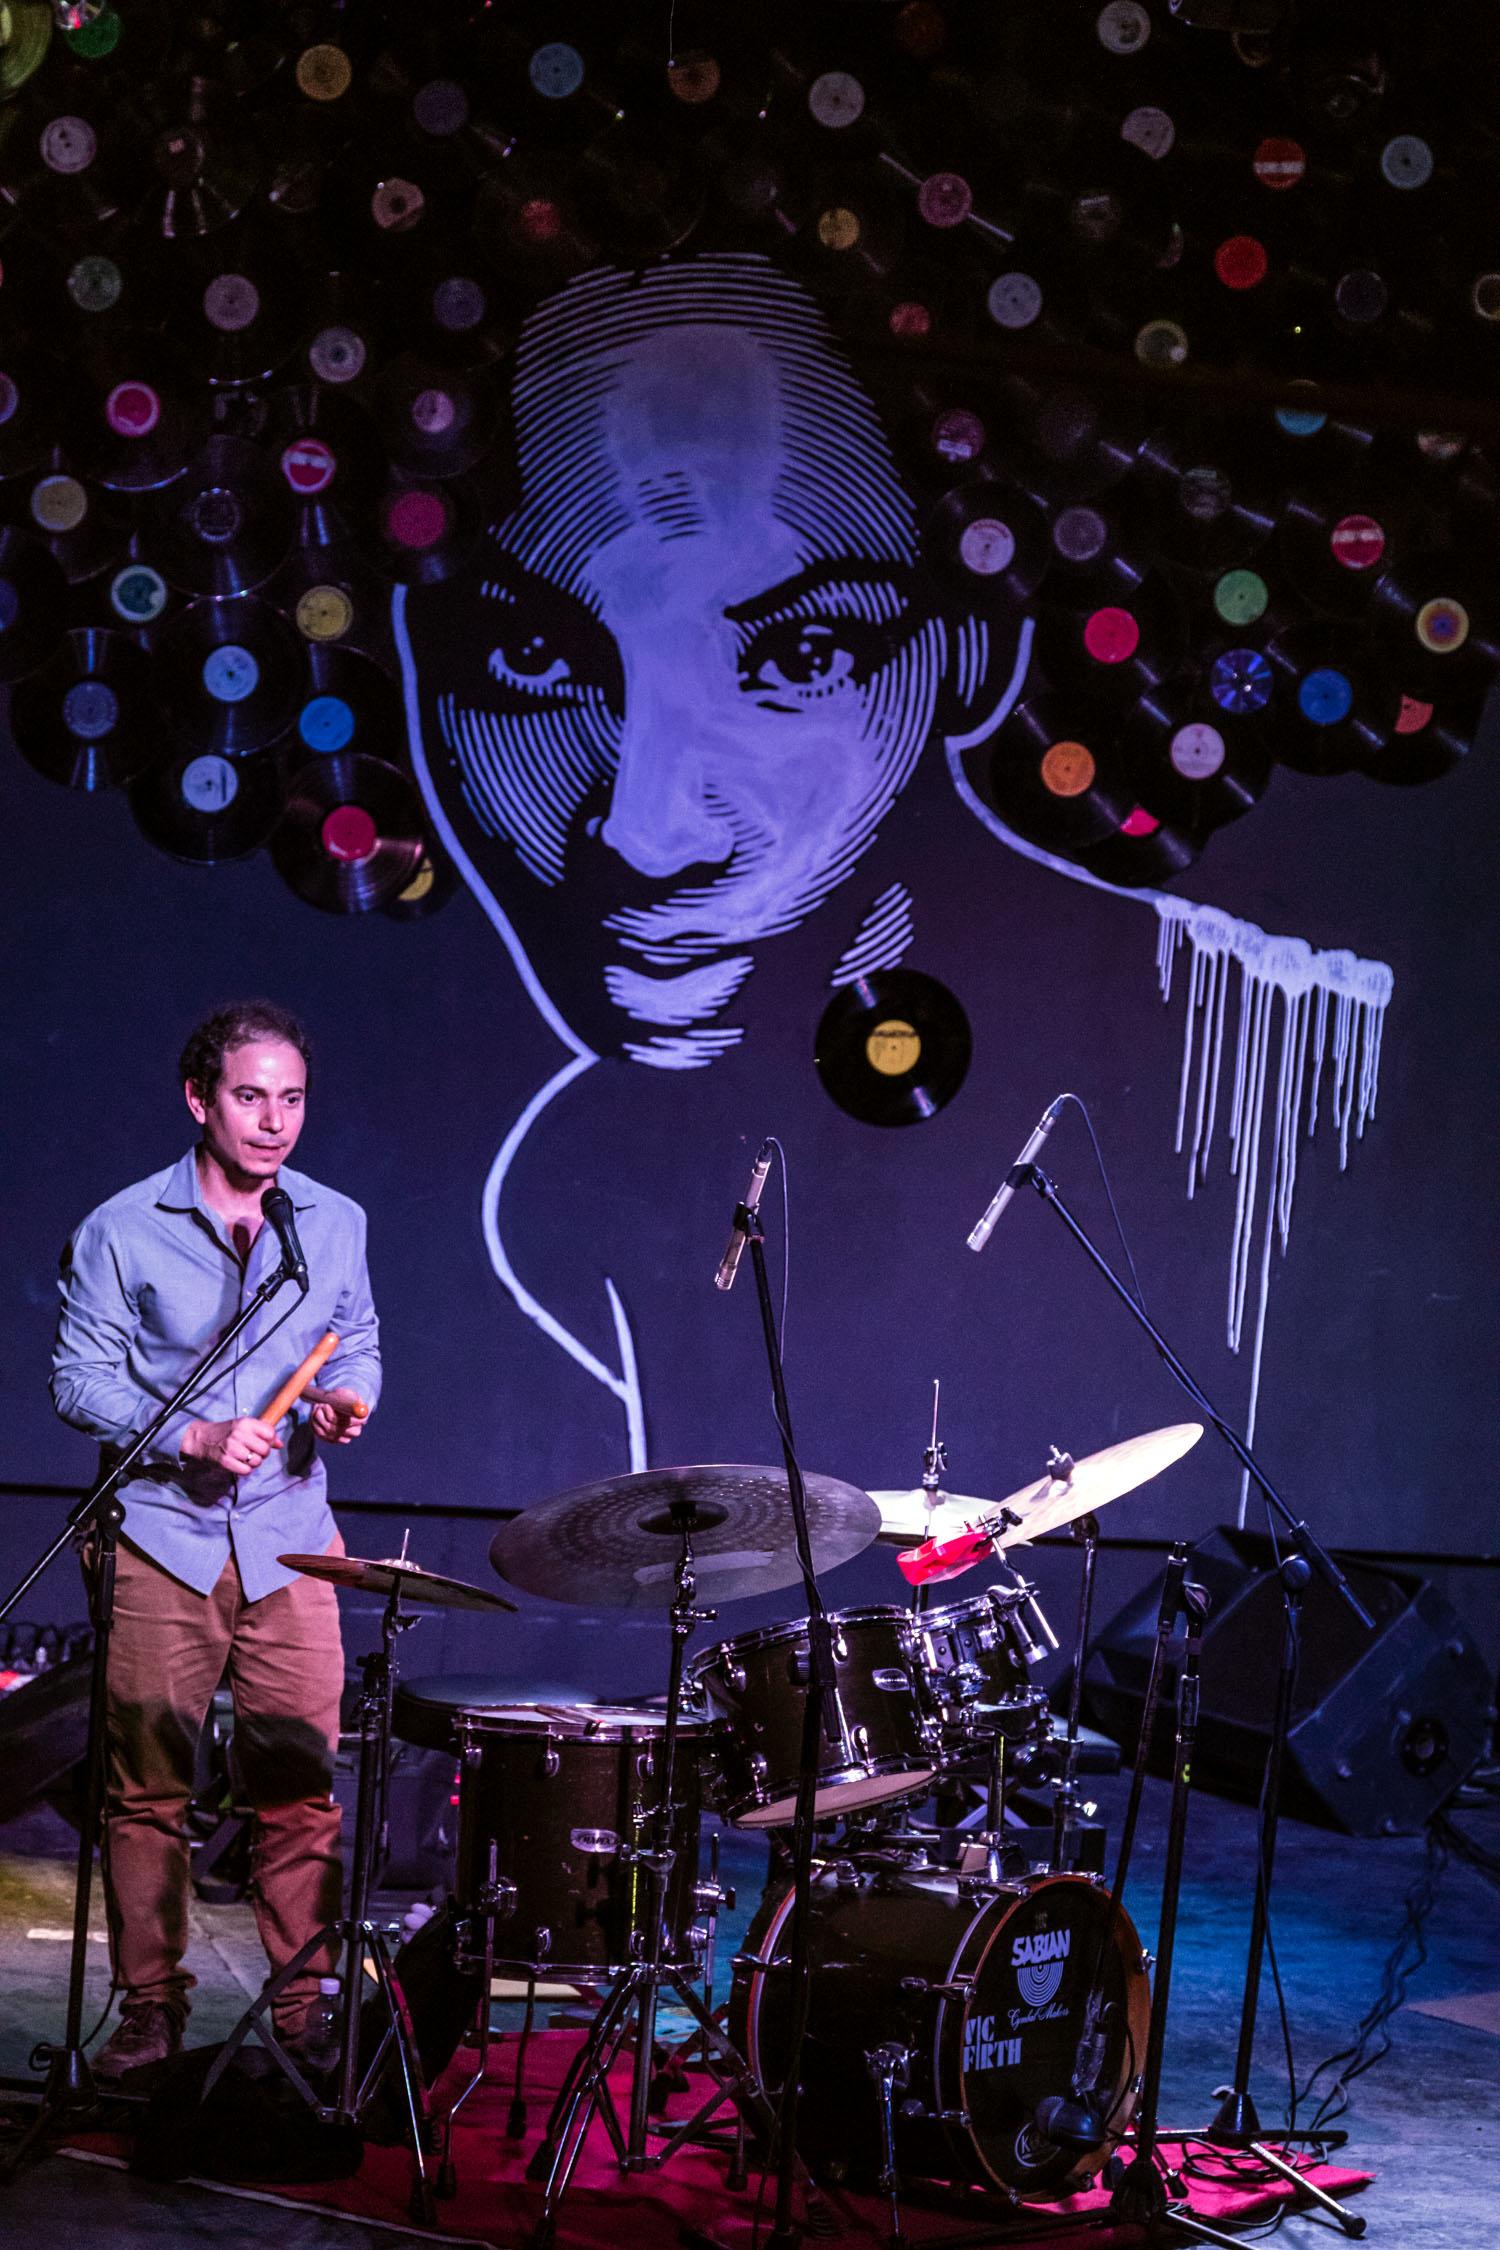 Dafnis Prieto at colloquium at Fabrica de Arte Cubano, Havana, Cuba, January 2019 (Photo by David Garten)